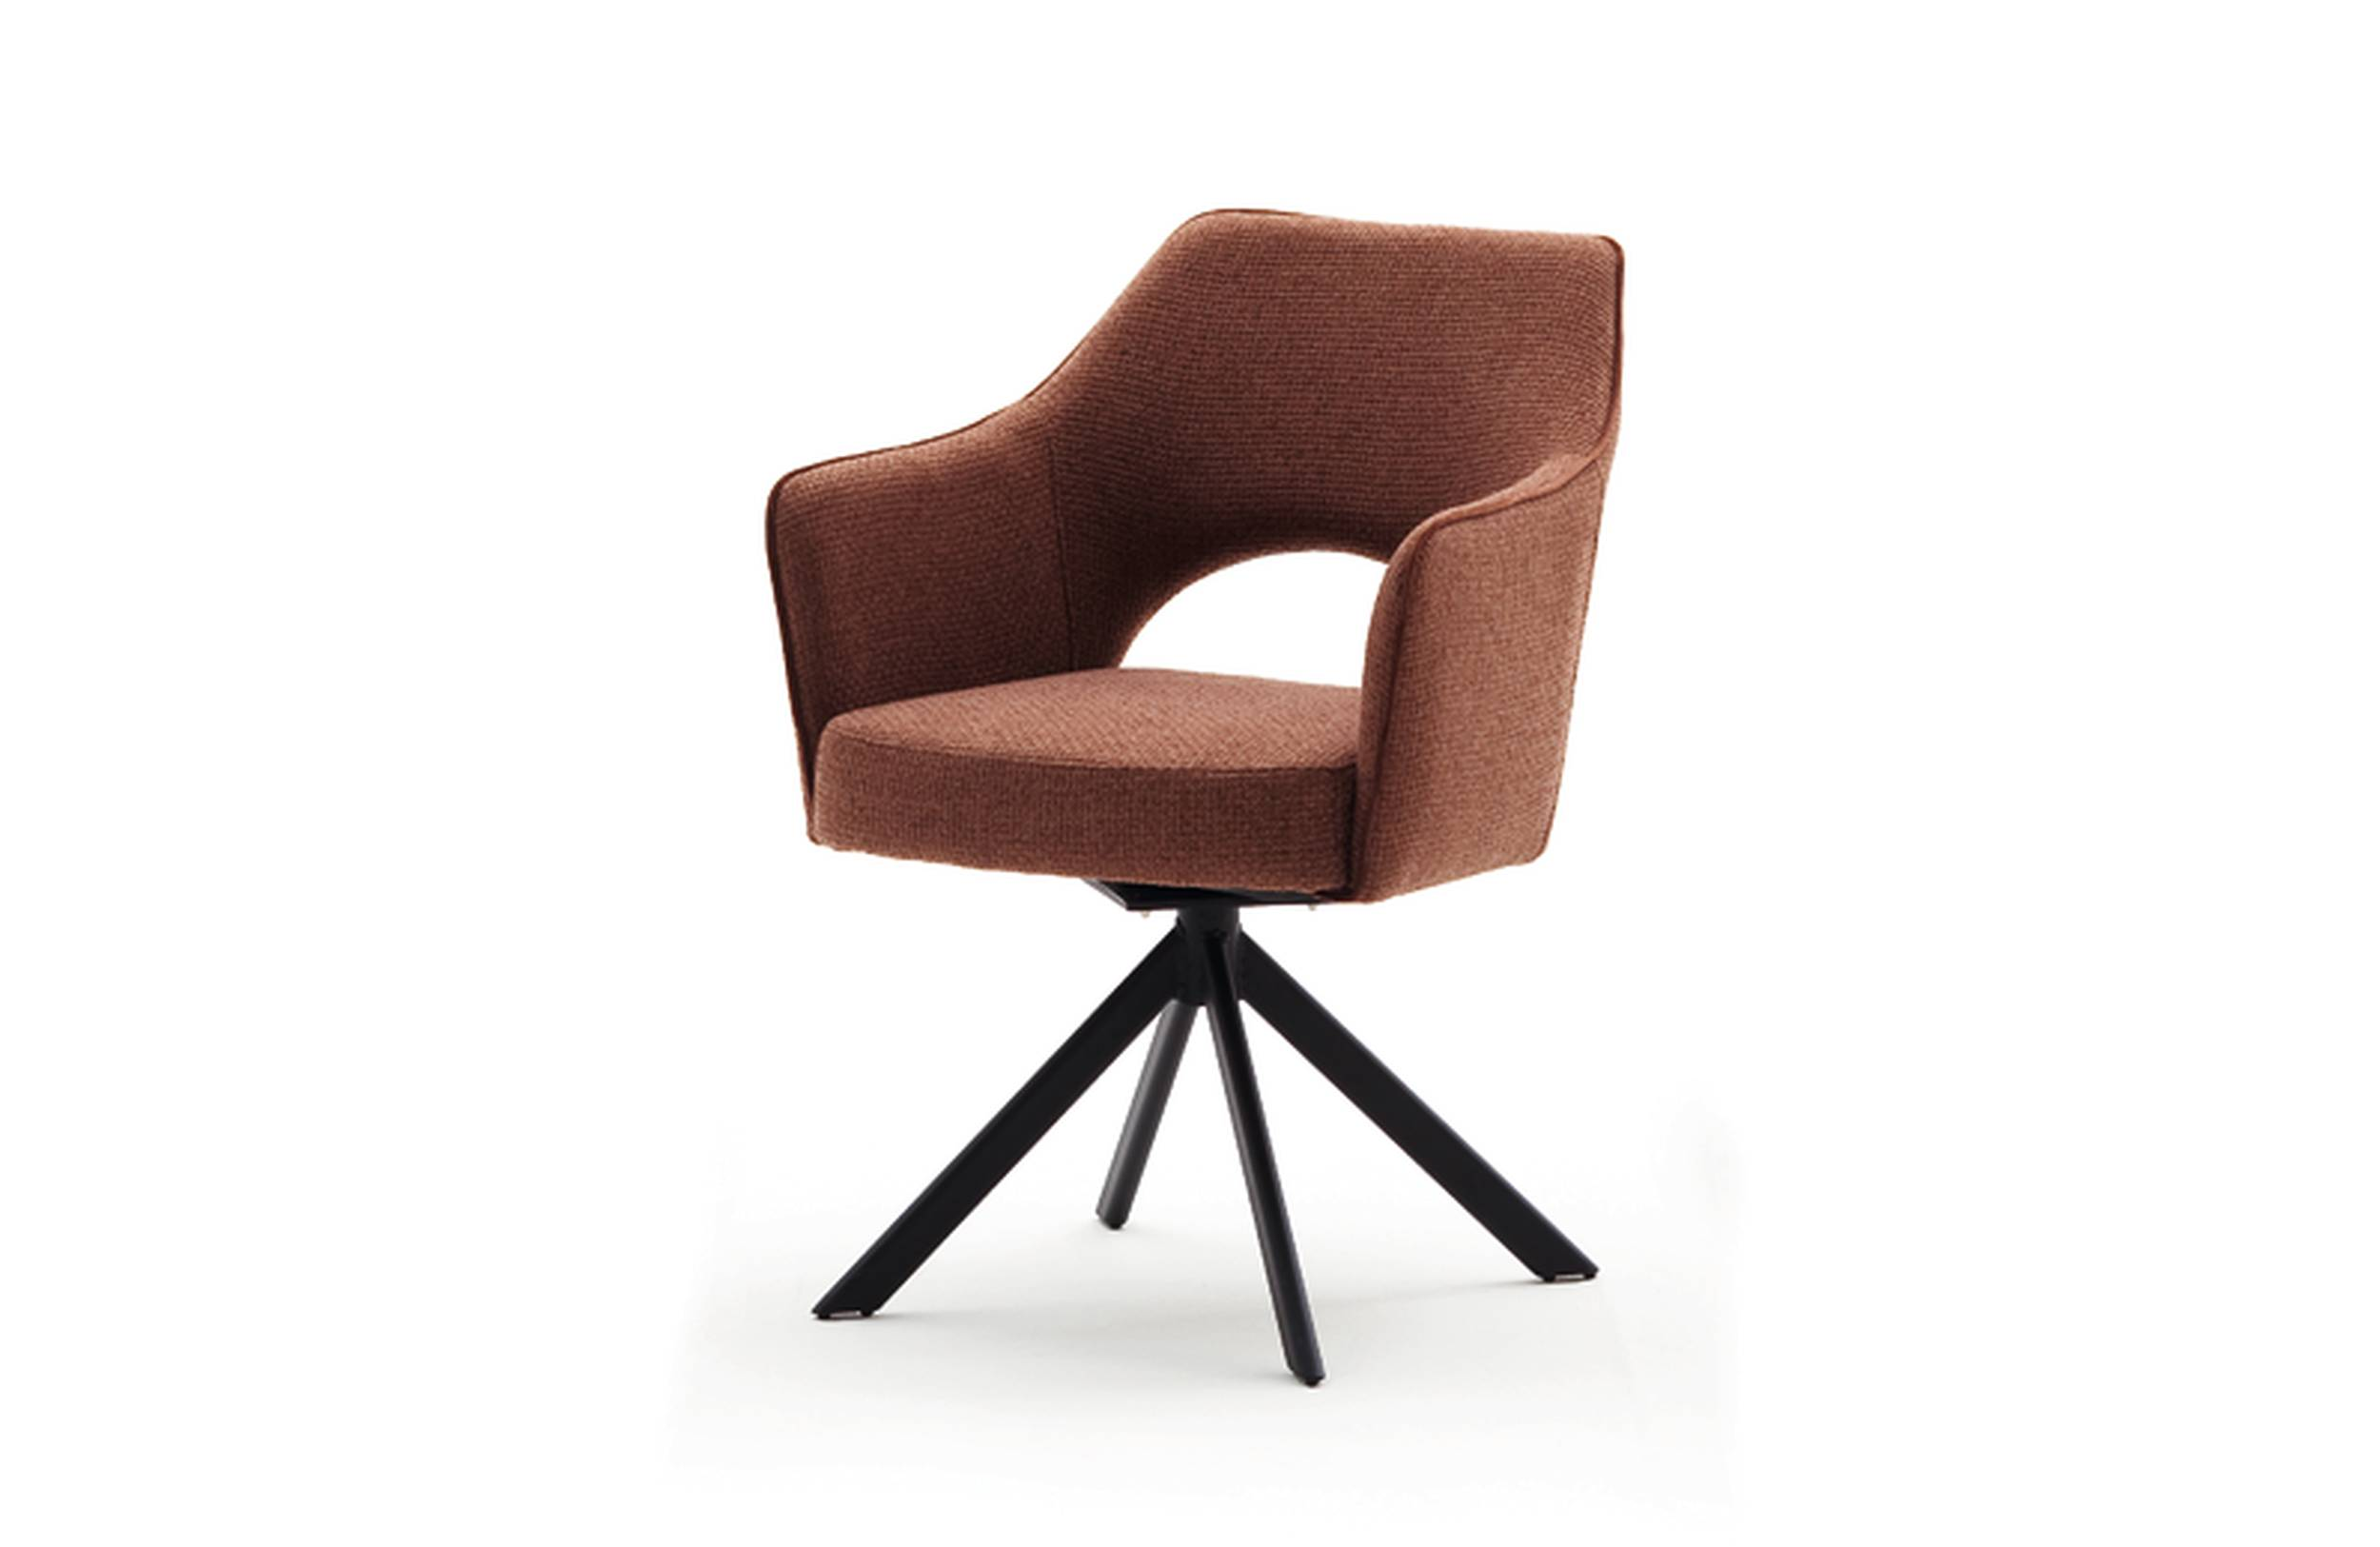 4-Fuß-Stuhl mit Armlehne   TOSKANA